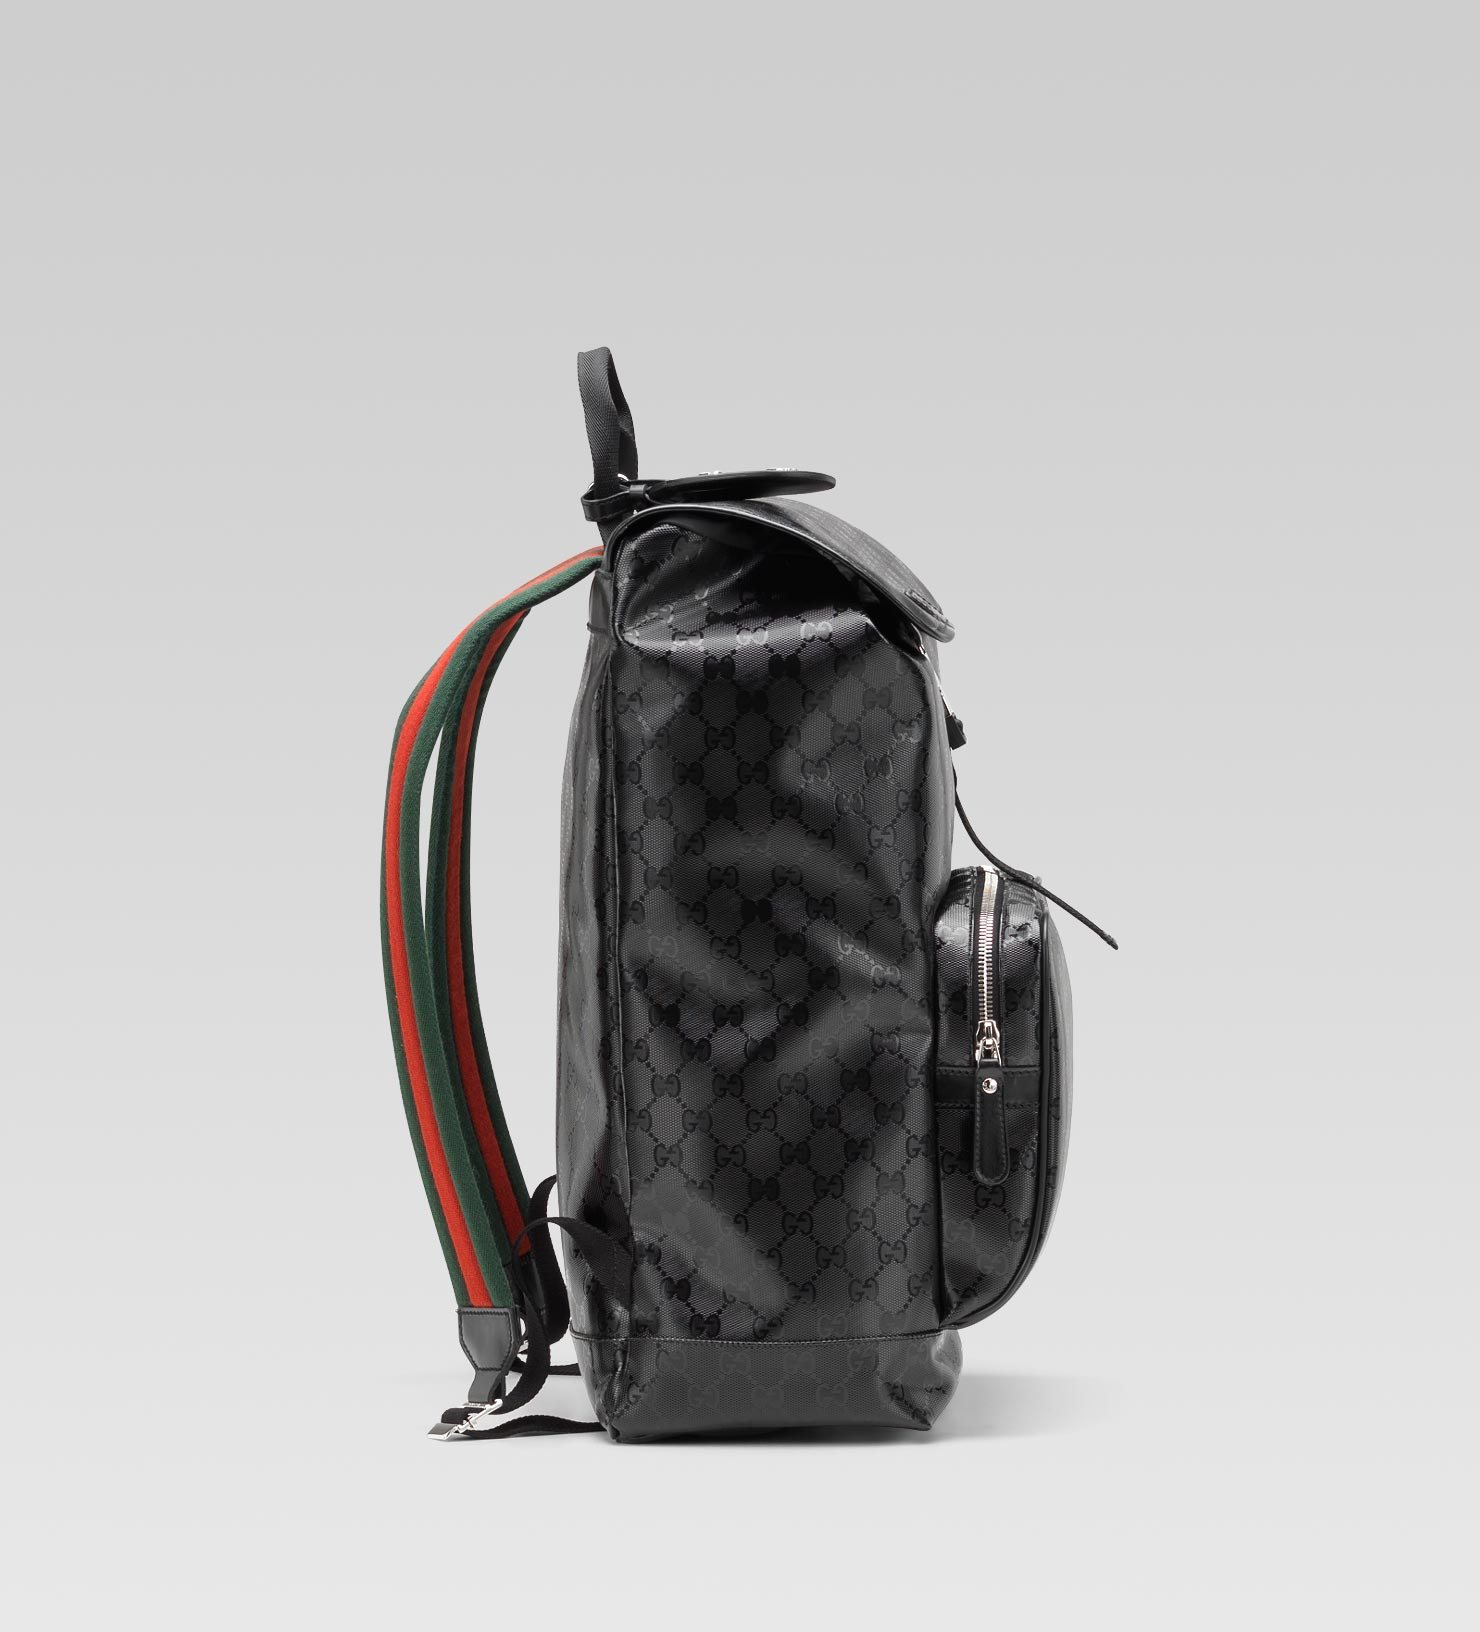 Lyst - Gucci Backpack in Black for Men